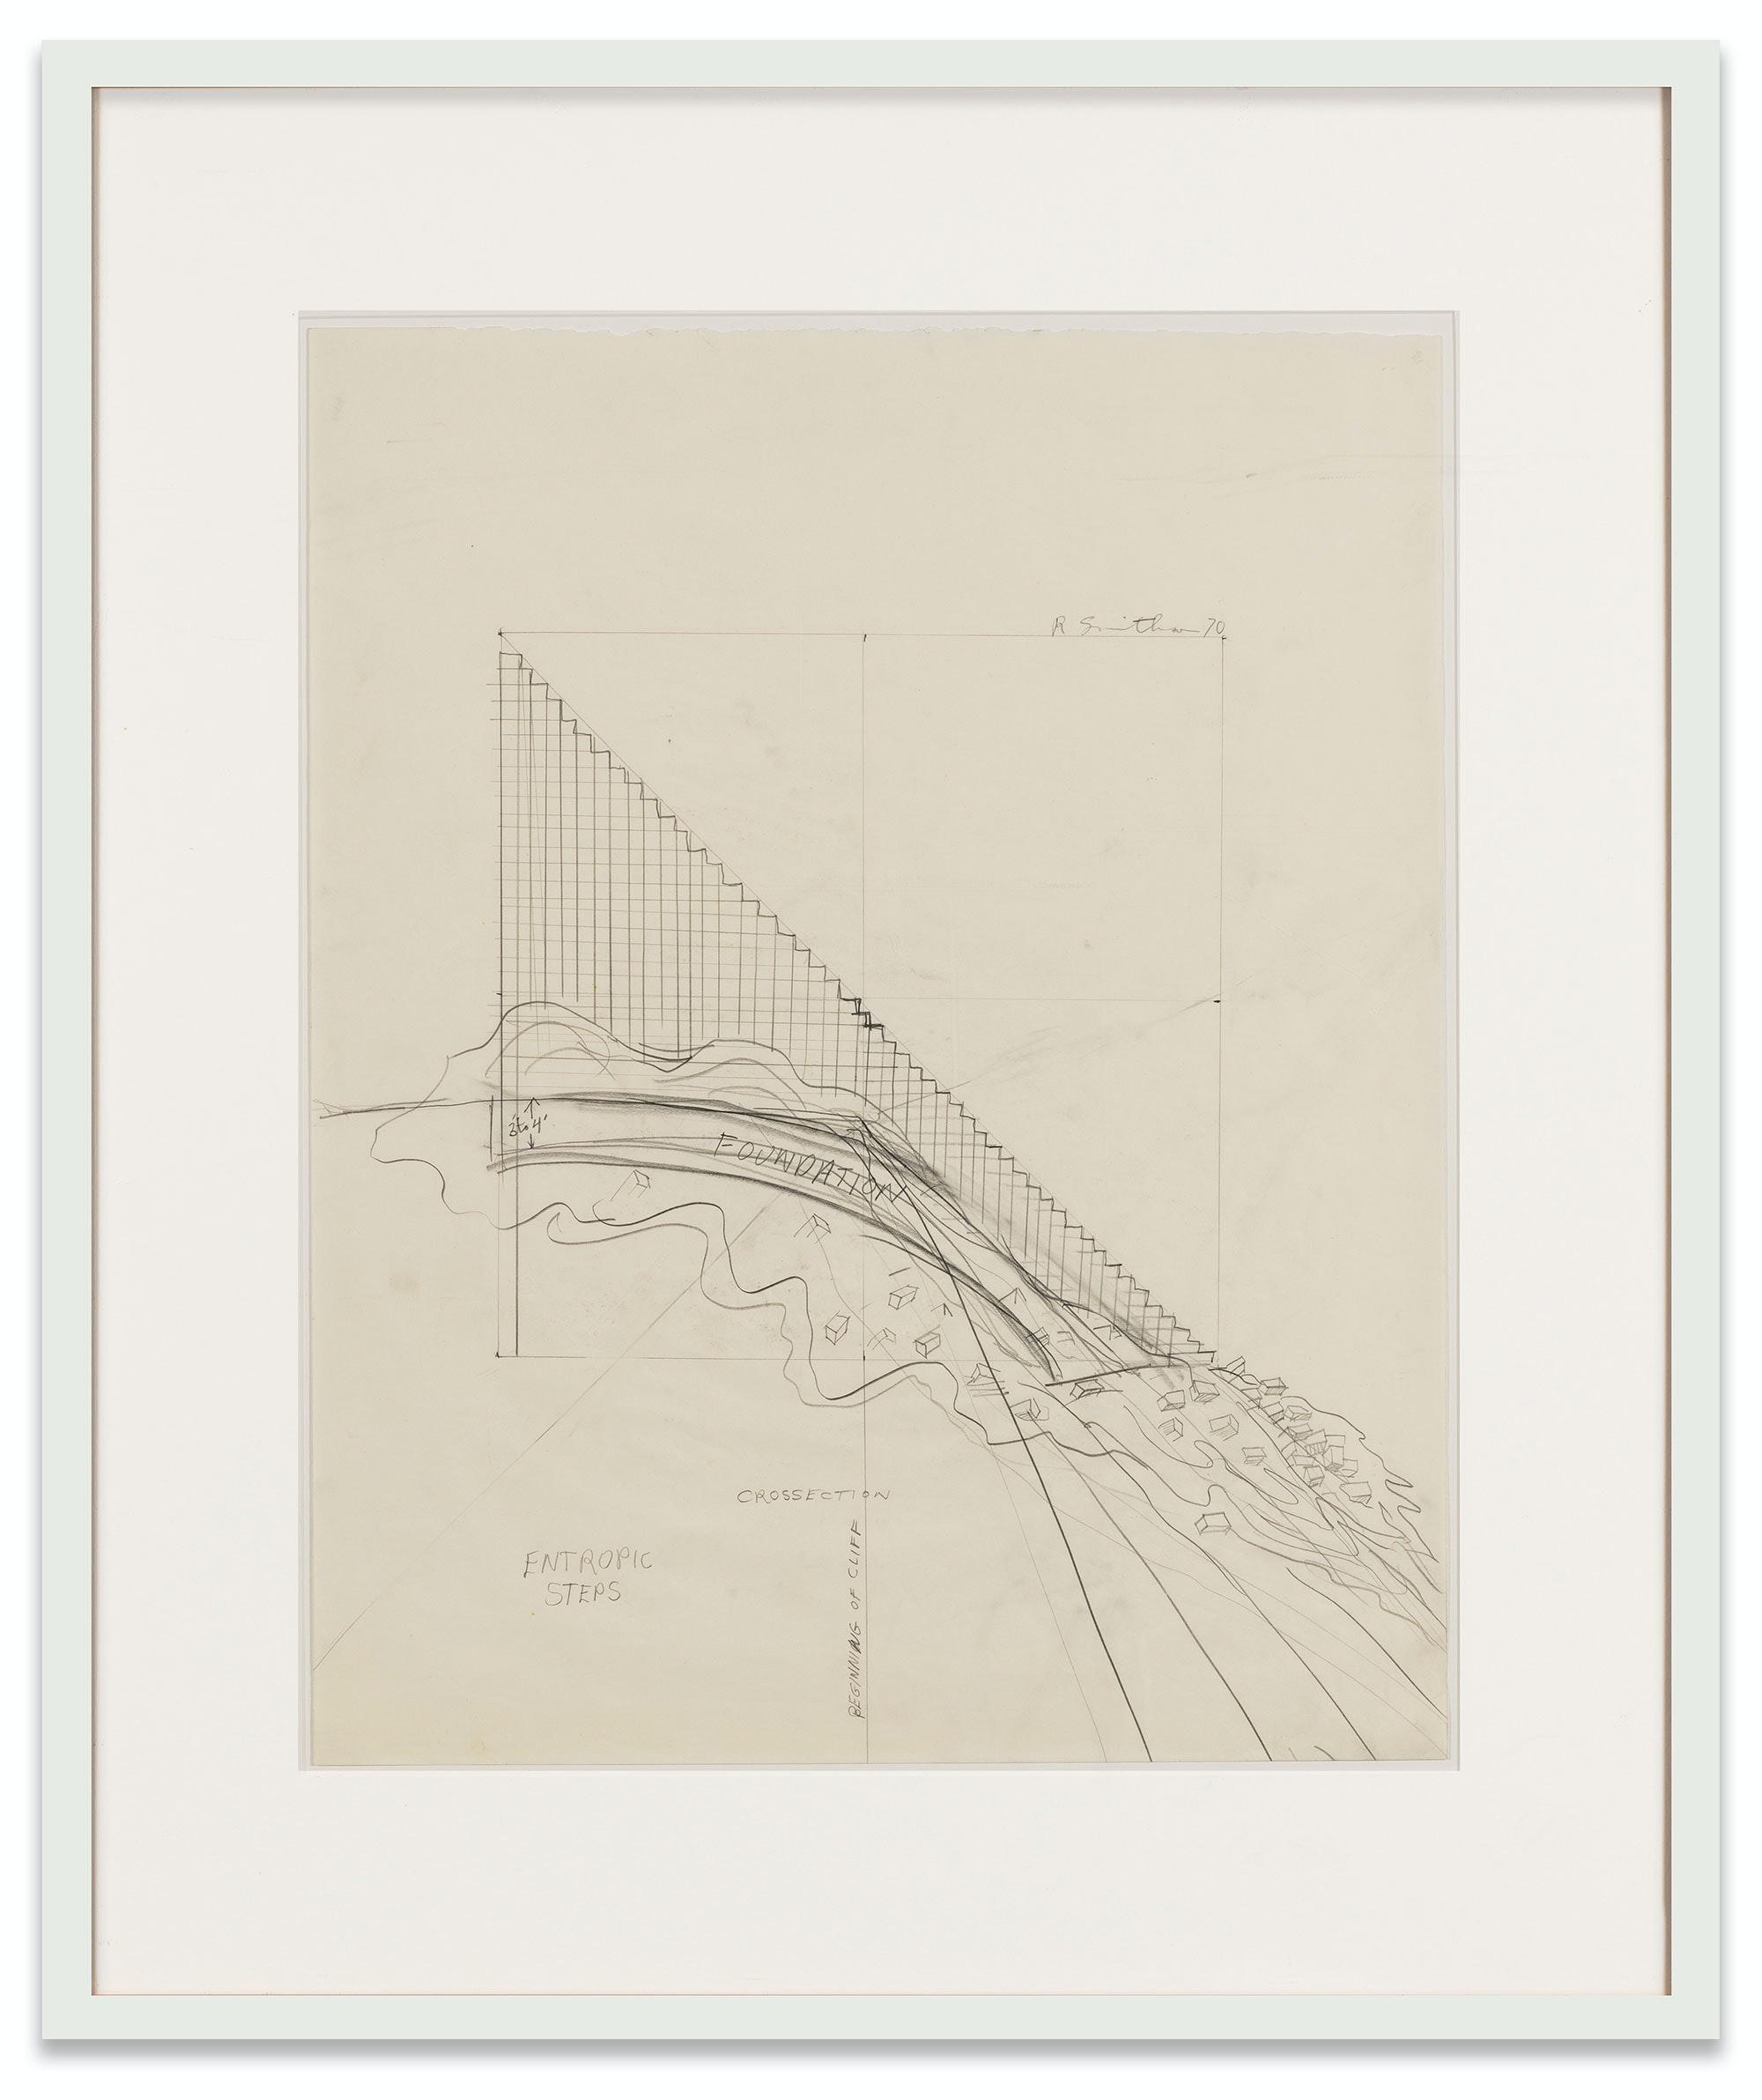 Robert Smithson, <em>Entropic Steps</em>, 1970. Pencil on paper, 19 x 24 inches. Courtesy Holt/Smithson Foundation and Marian Goodman Gallery. © Holt/Smithson Foundation, Licensed by VAGA at ARS, New York. Photo: Alex Yudzon.